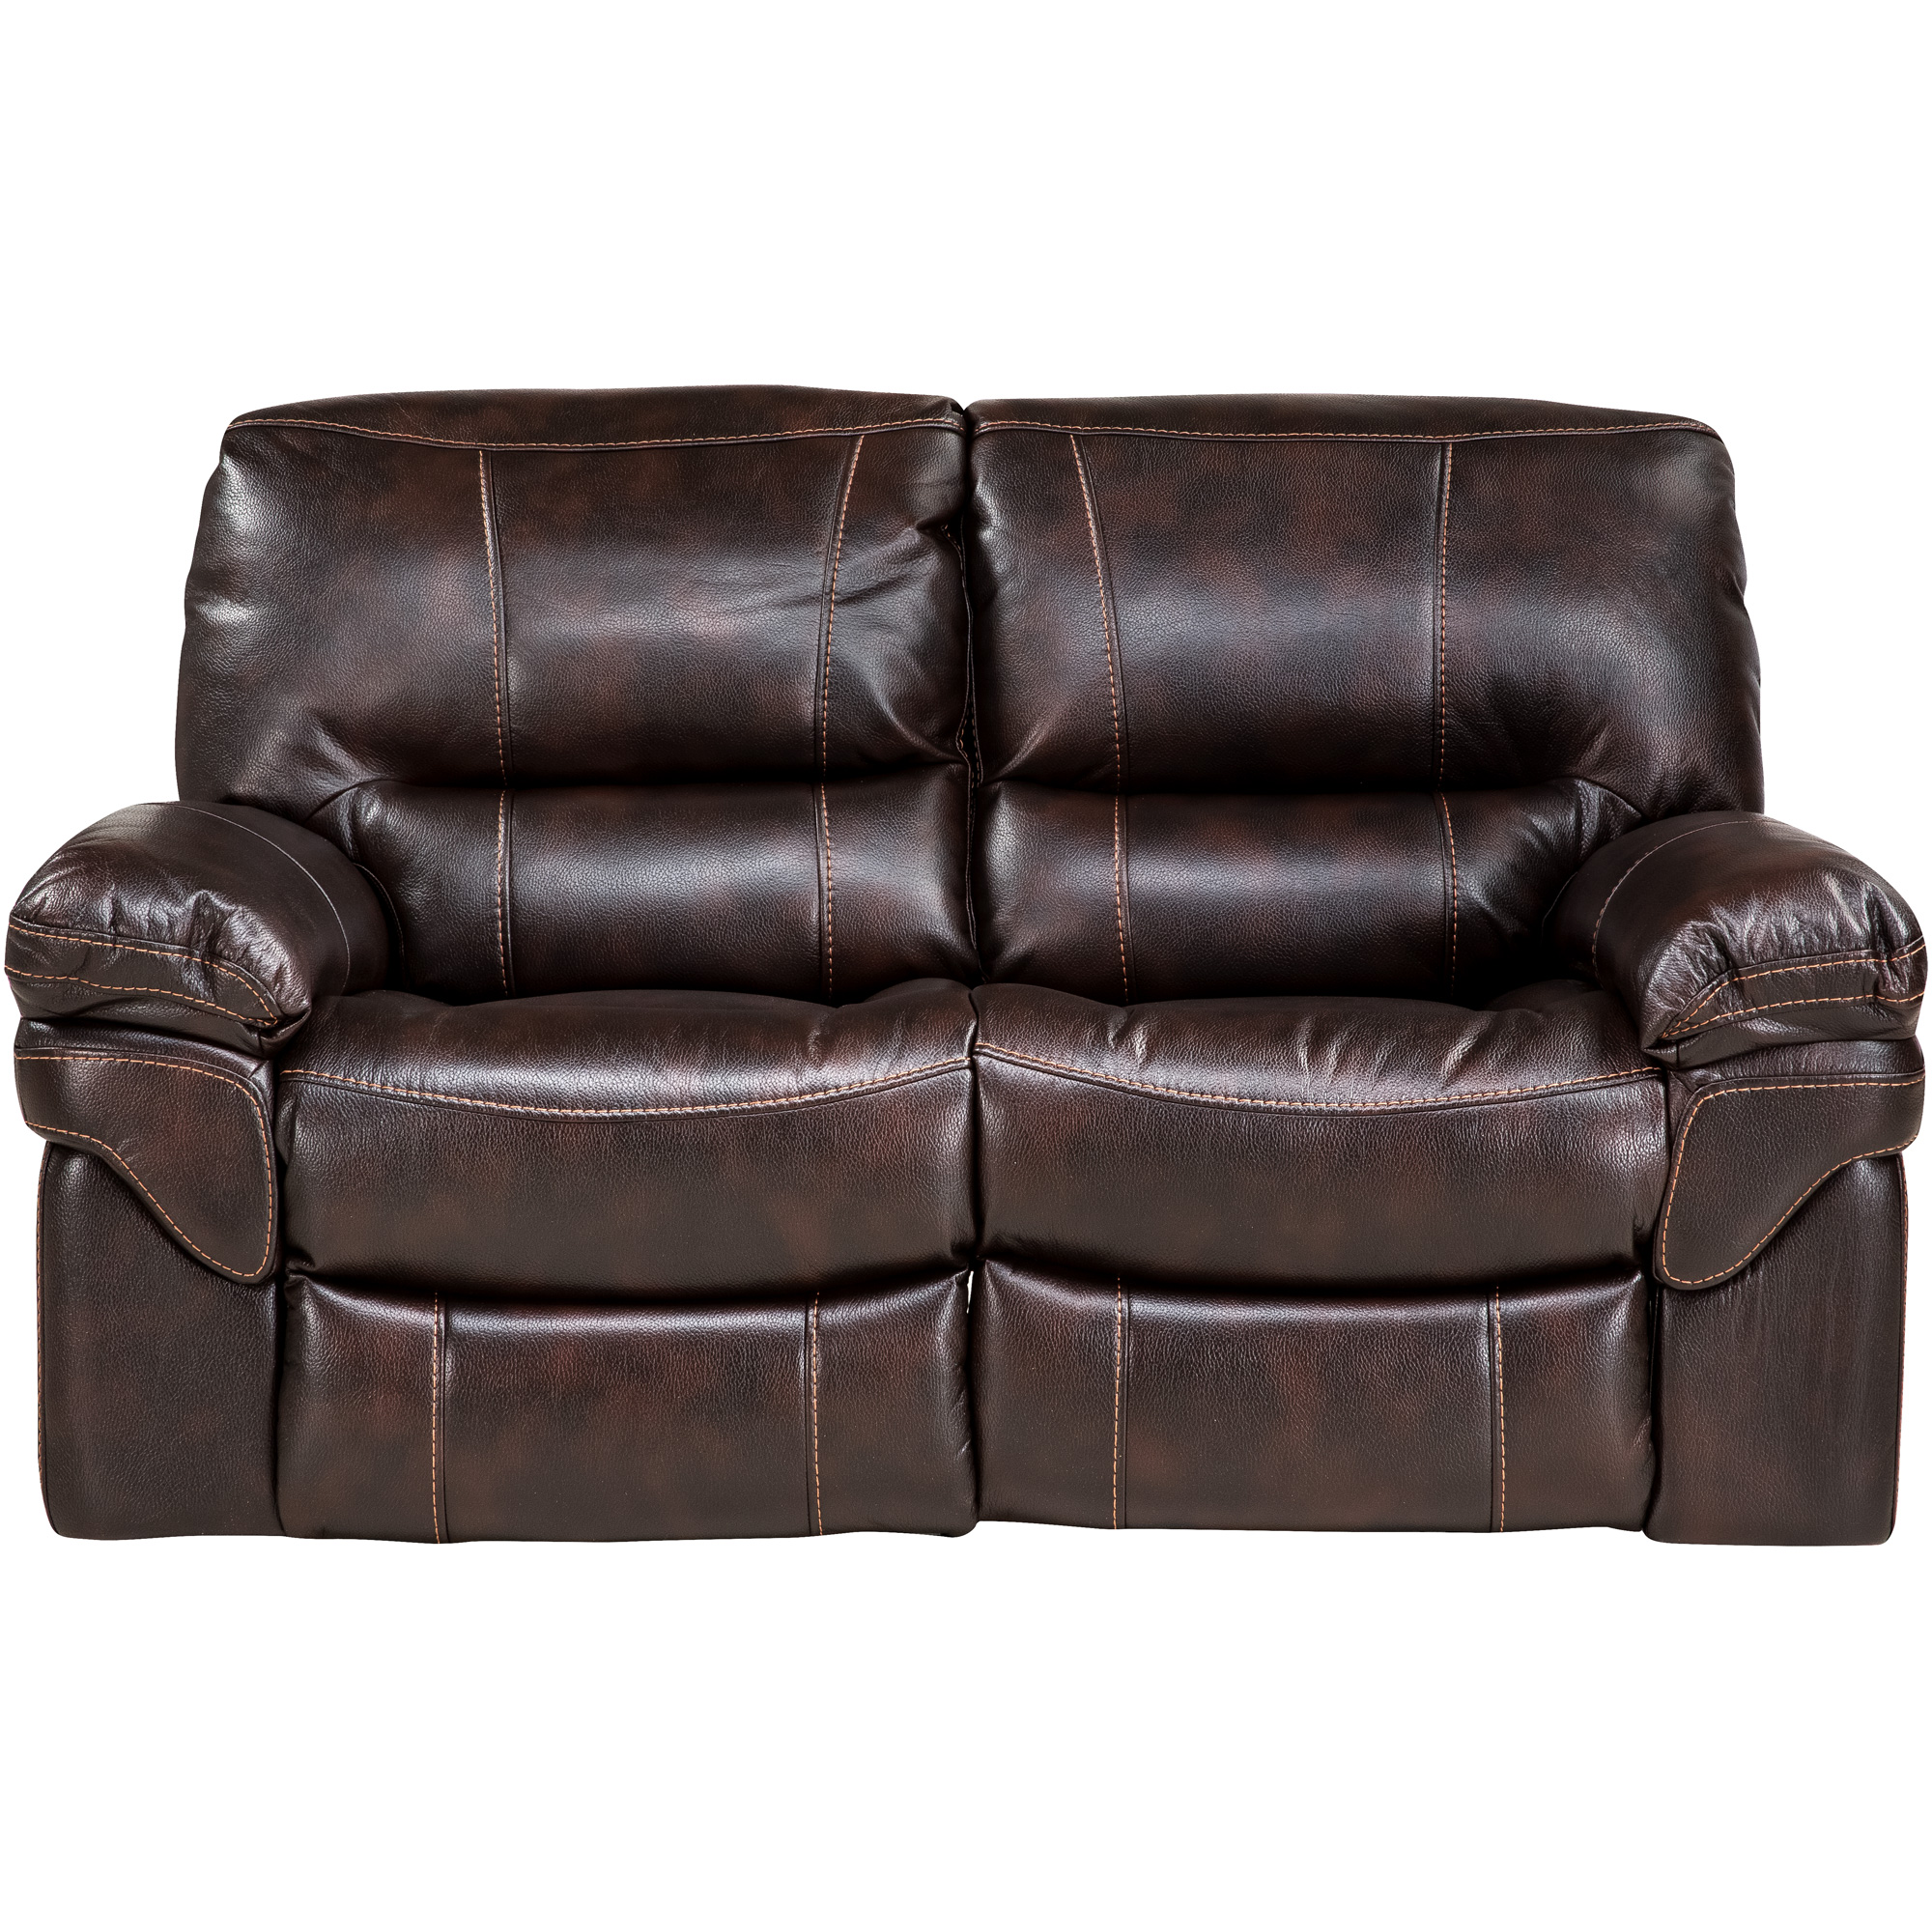 Wah Cheers | Valdez Brown Reclining Loveseat Sofa